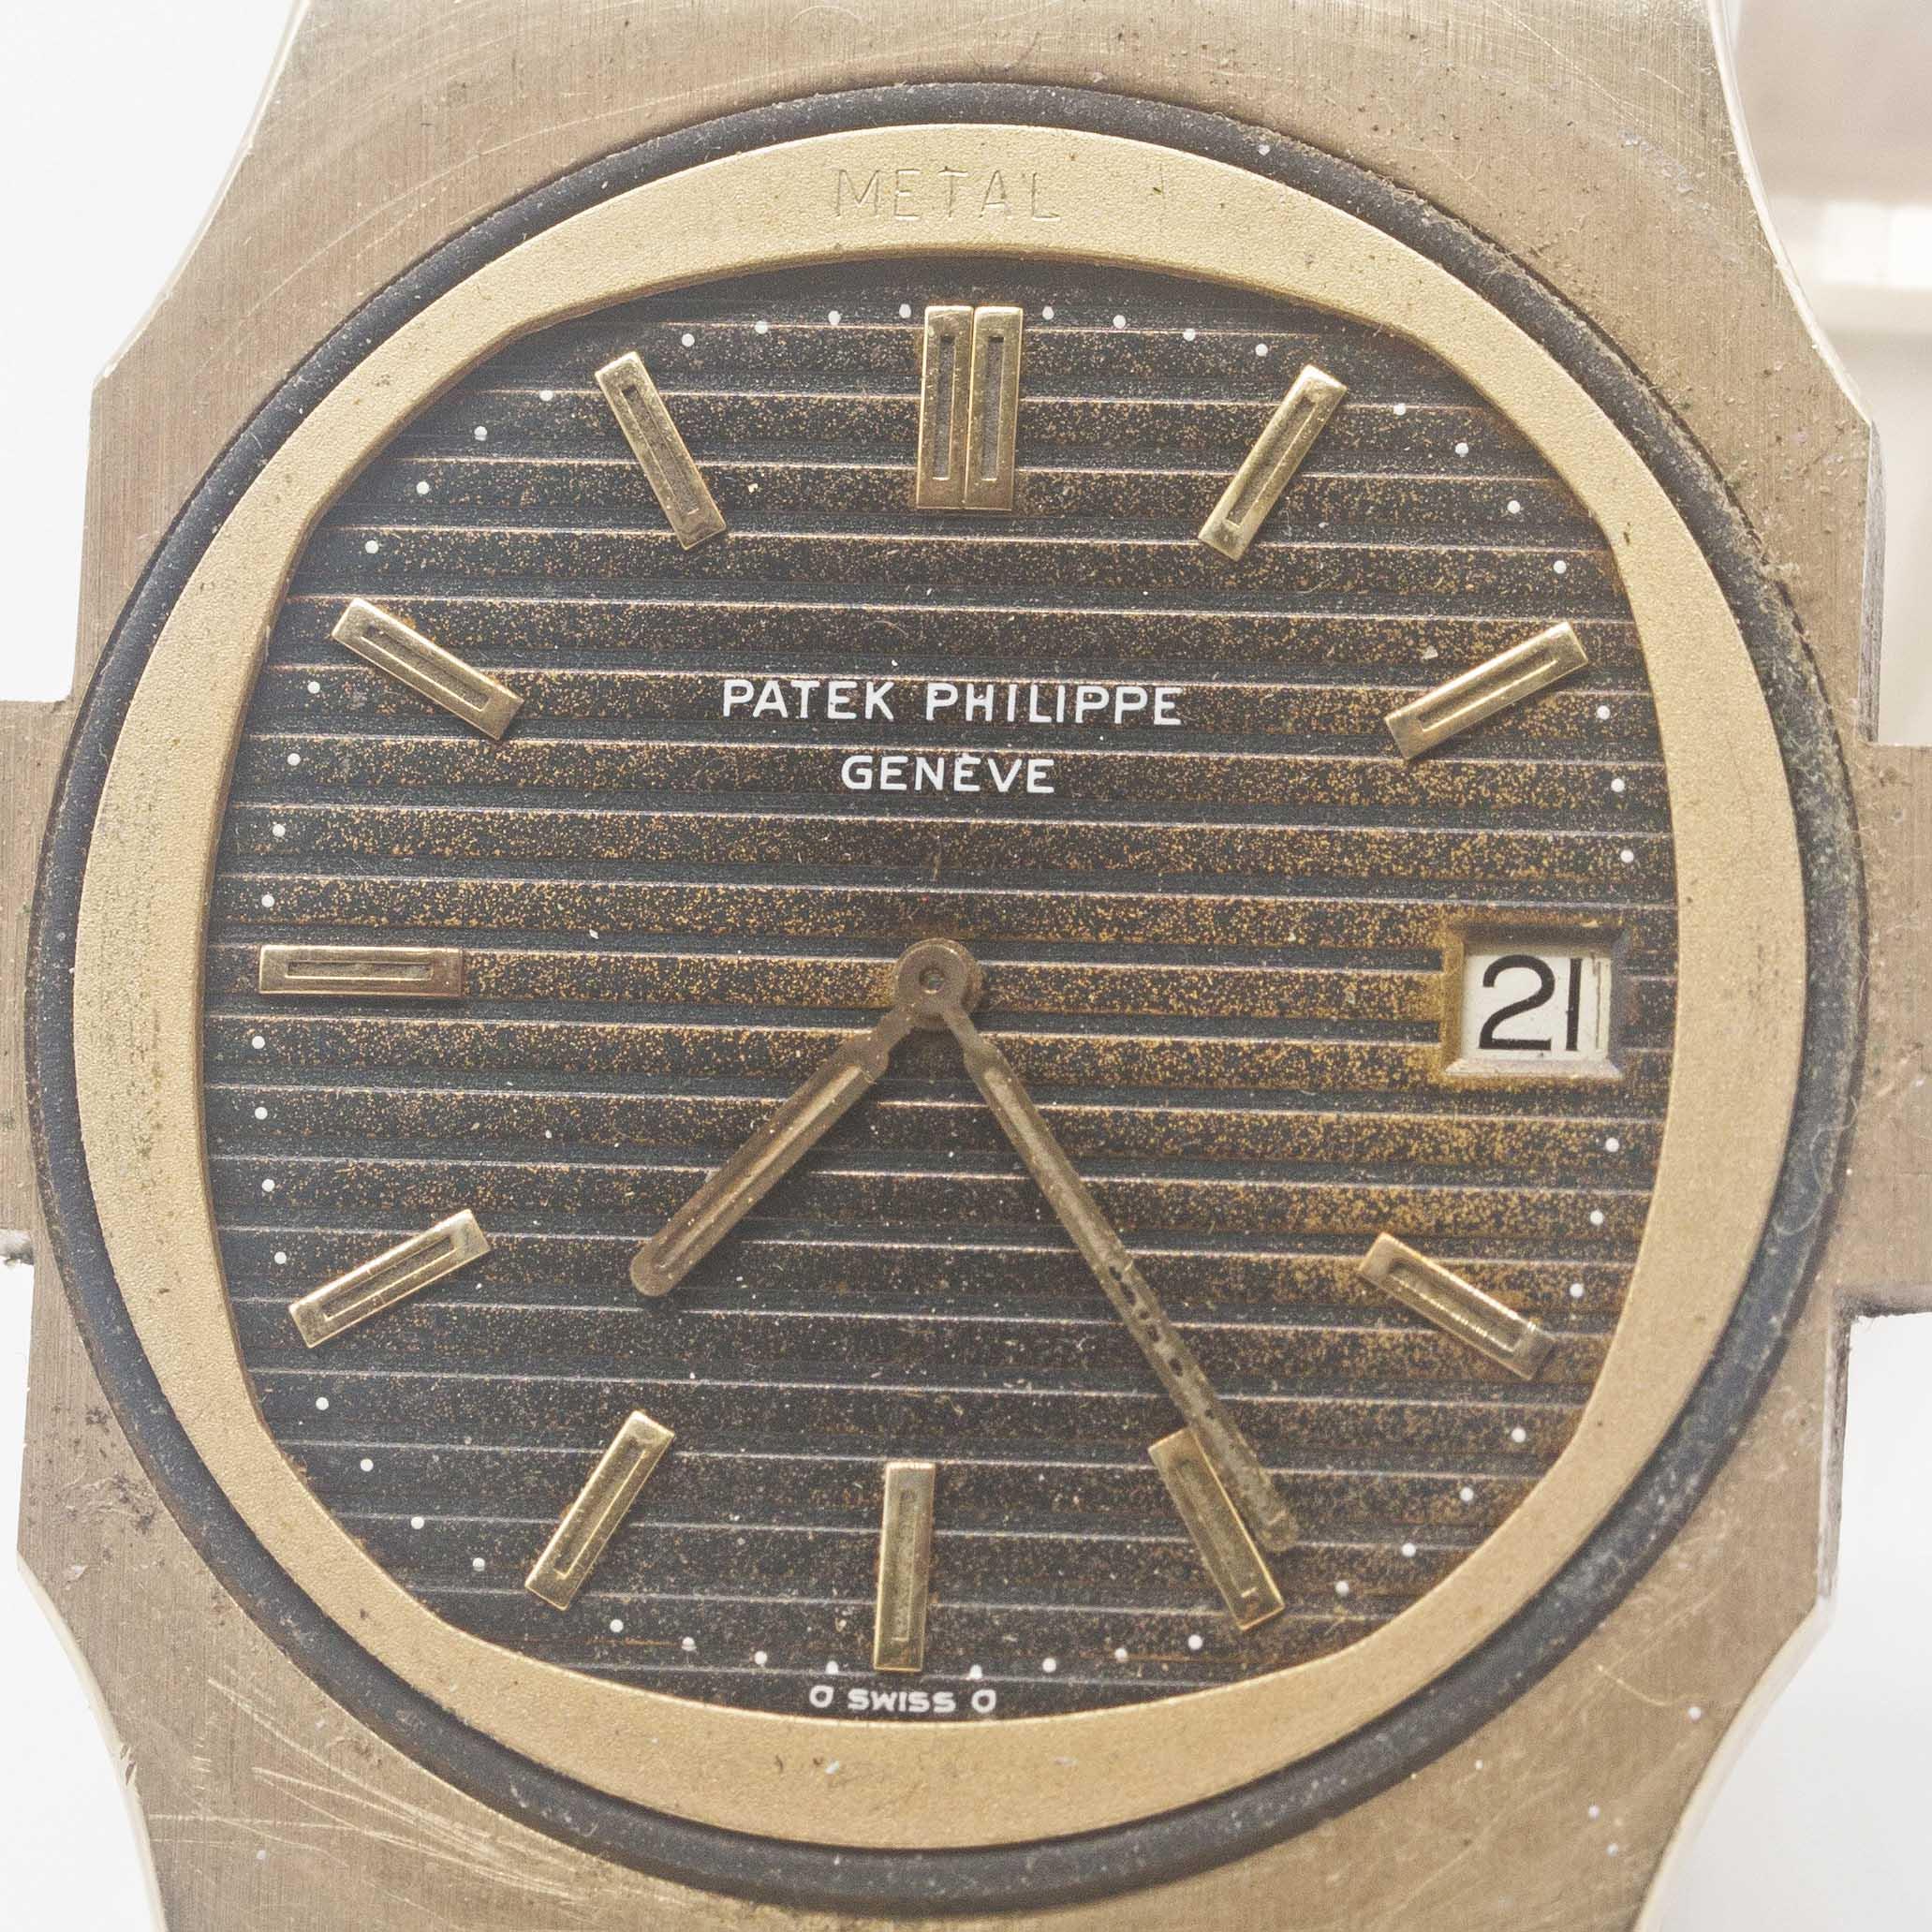 "Lot 167 - A VERY RARE GENTLEMAN'S 18K SOLID YELLOW GOLD PATEK PHILIPPE NAUTILUS ""JUMBO"" BRACELET WATCH DATED"